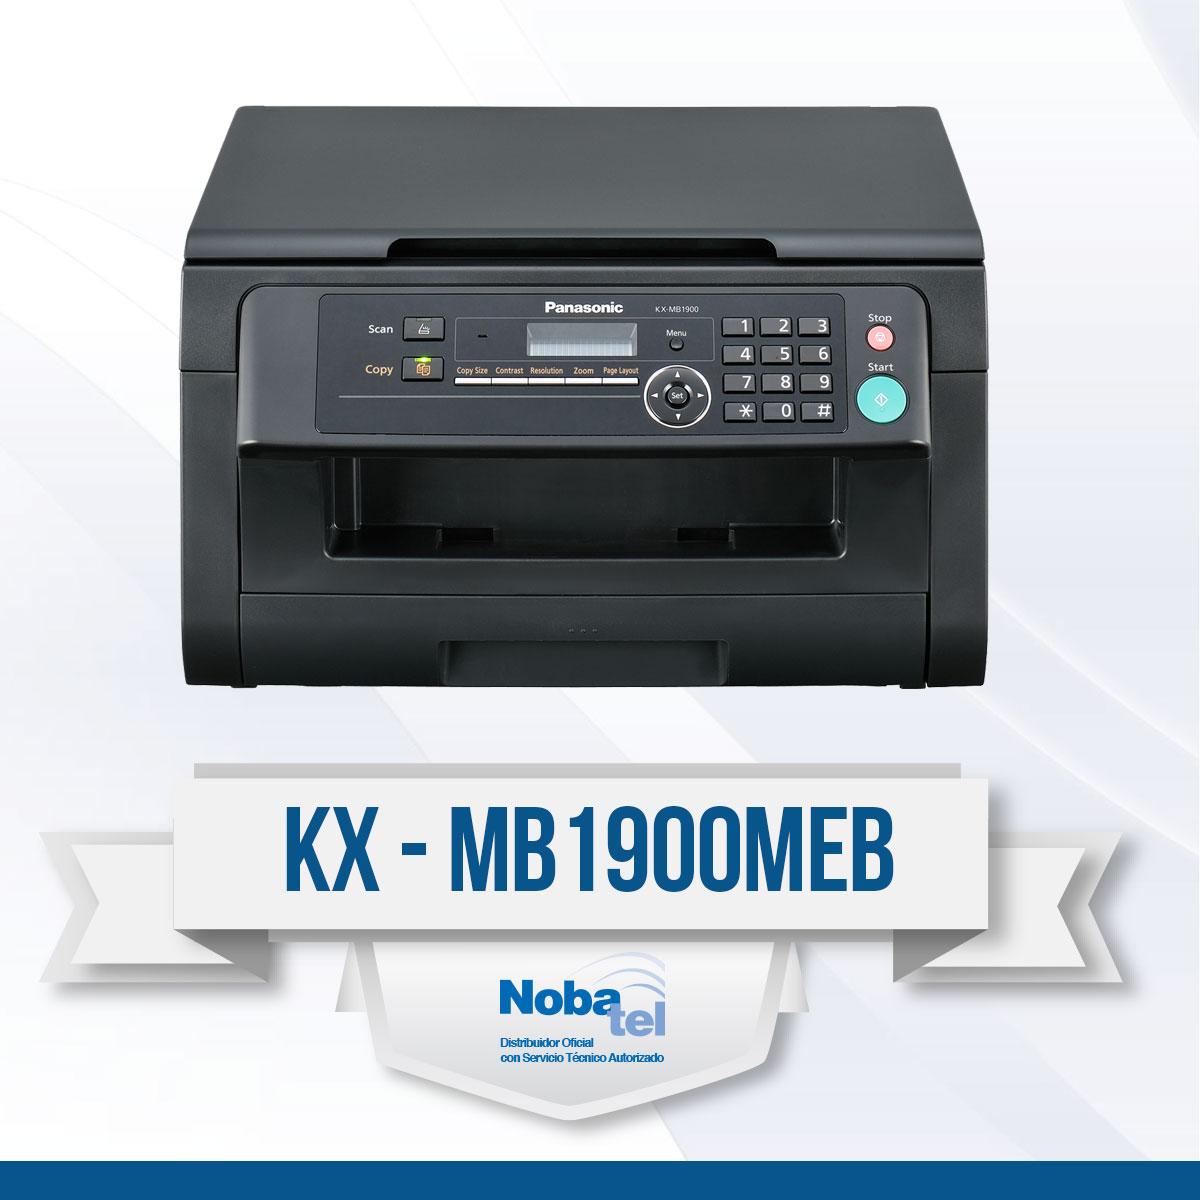 KX-MB1900MEB